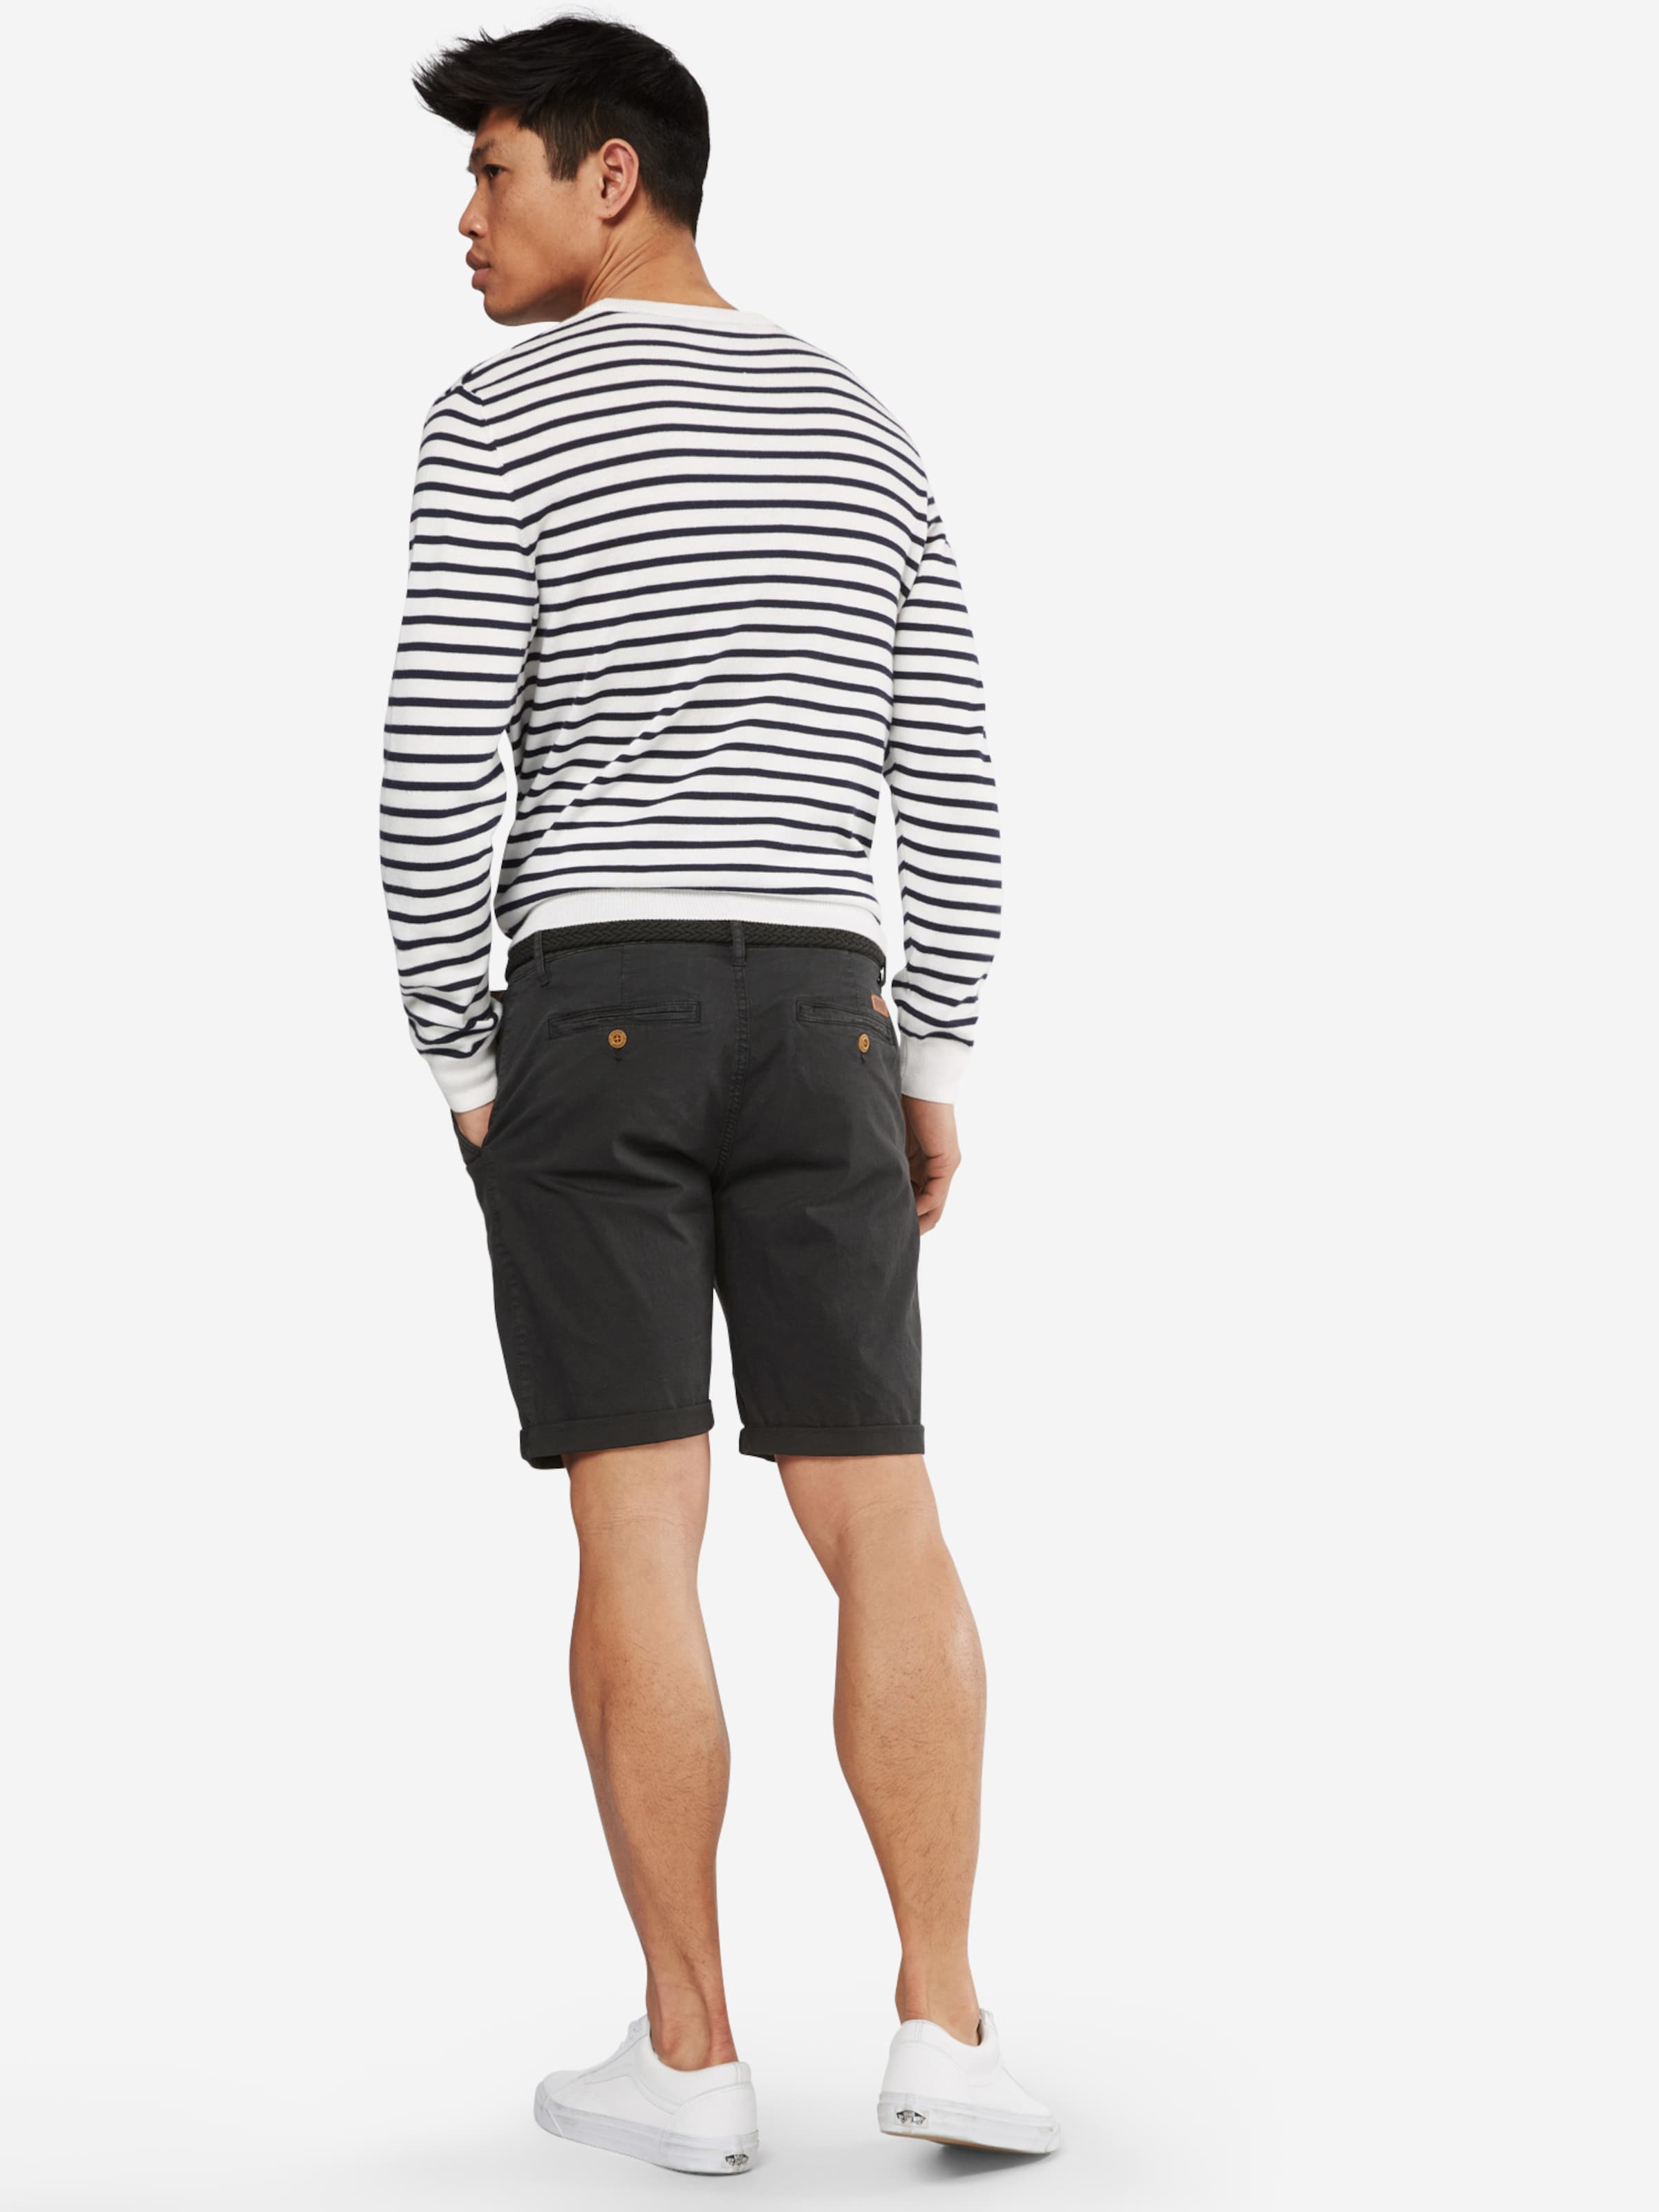 Jeans Indicode Pantalon 'conor' En Anthracite Chino Ybgfy67